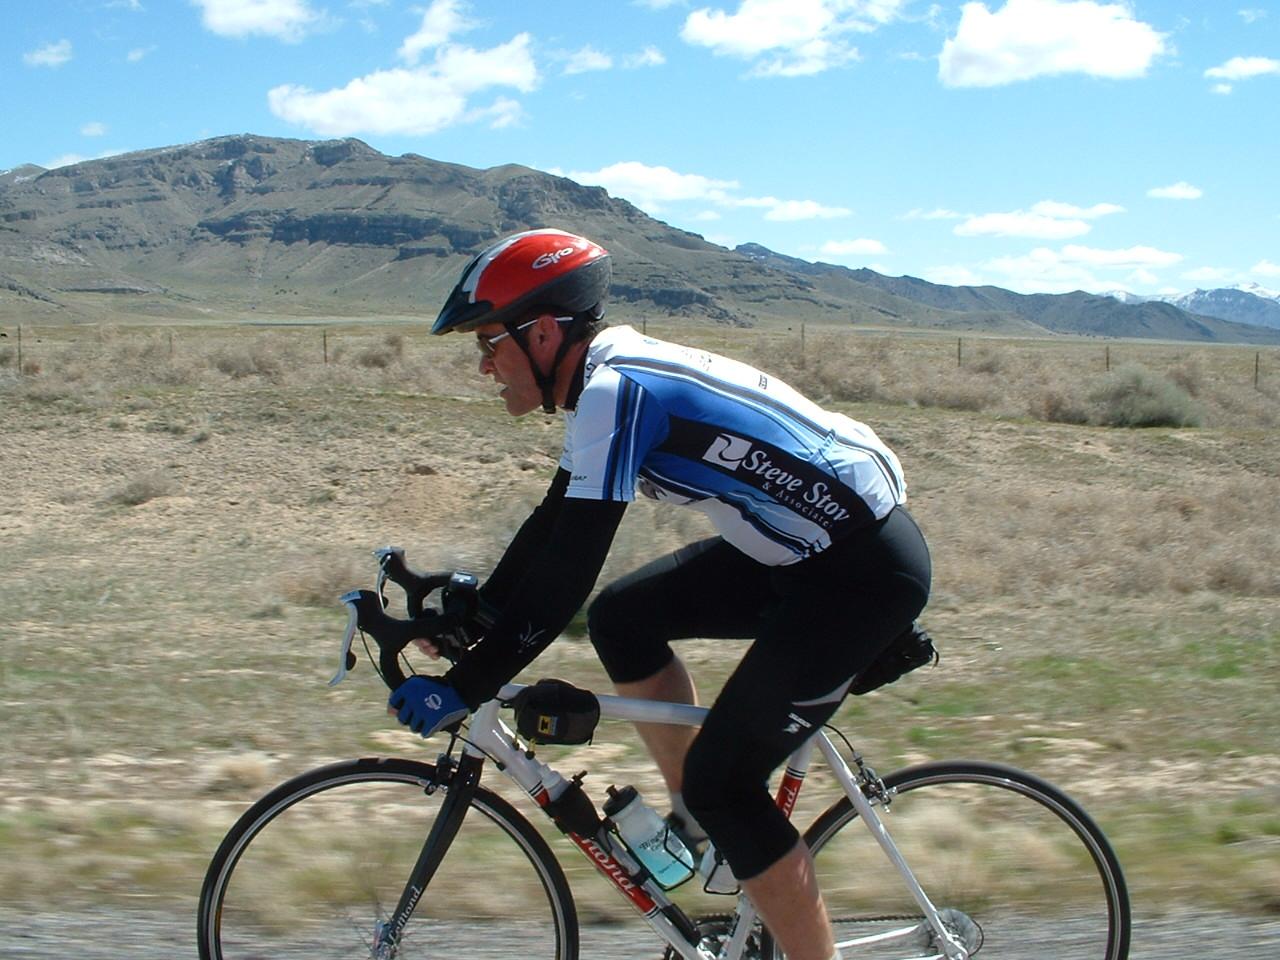 BBAD (Border to Border Against Diabetes) - Arizona/Utah border to Idaho/Utah border